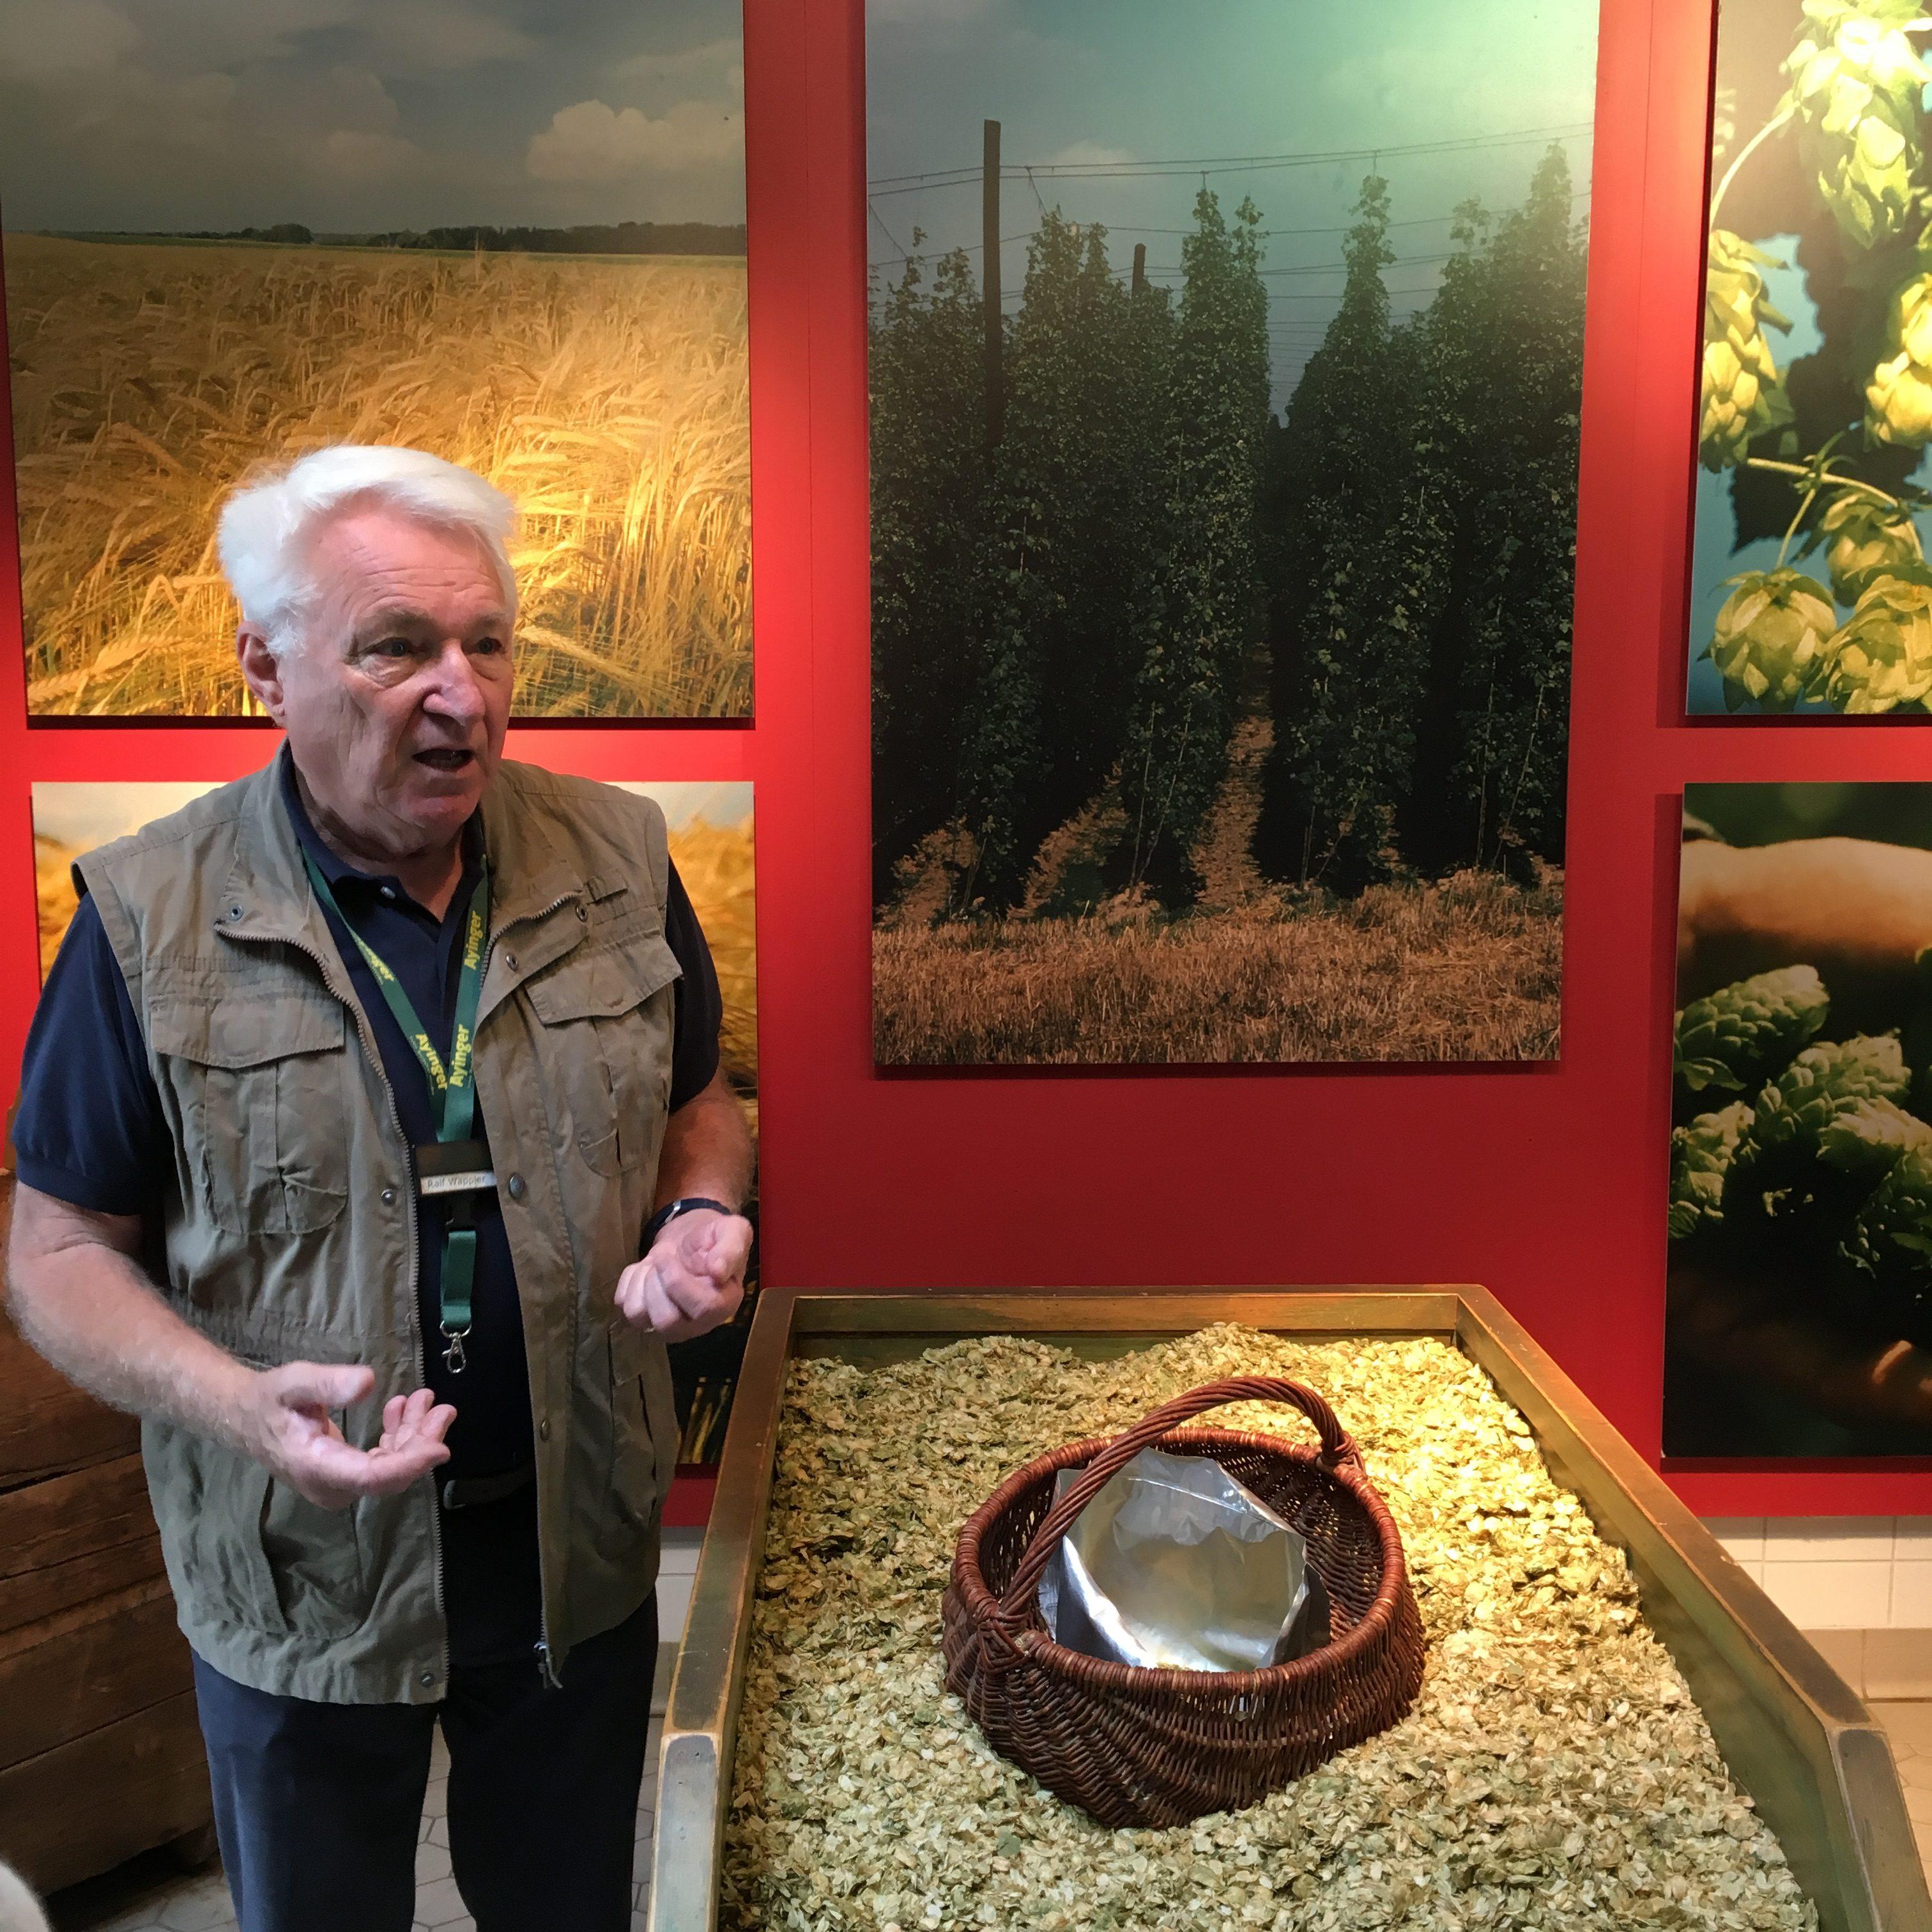 Ayinger tour guide Ralf Wappler describing the German hops.